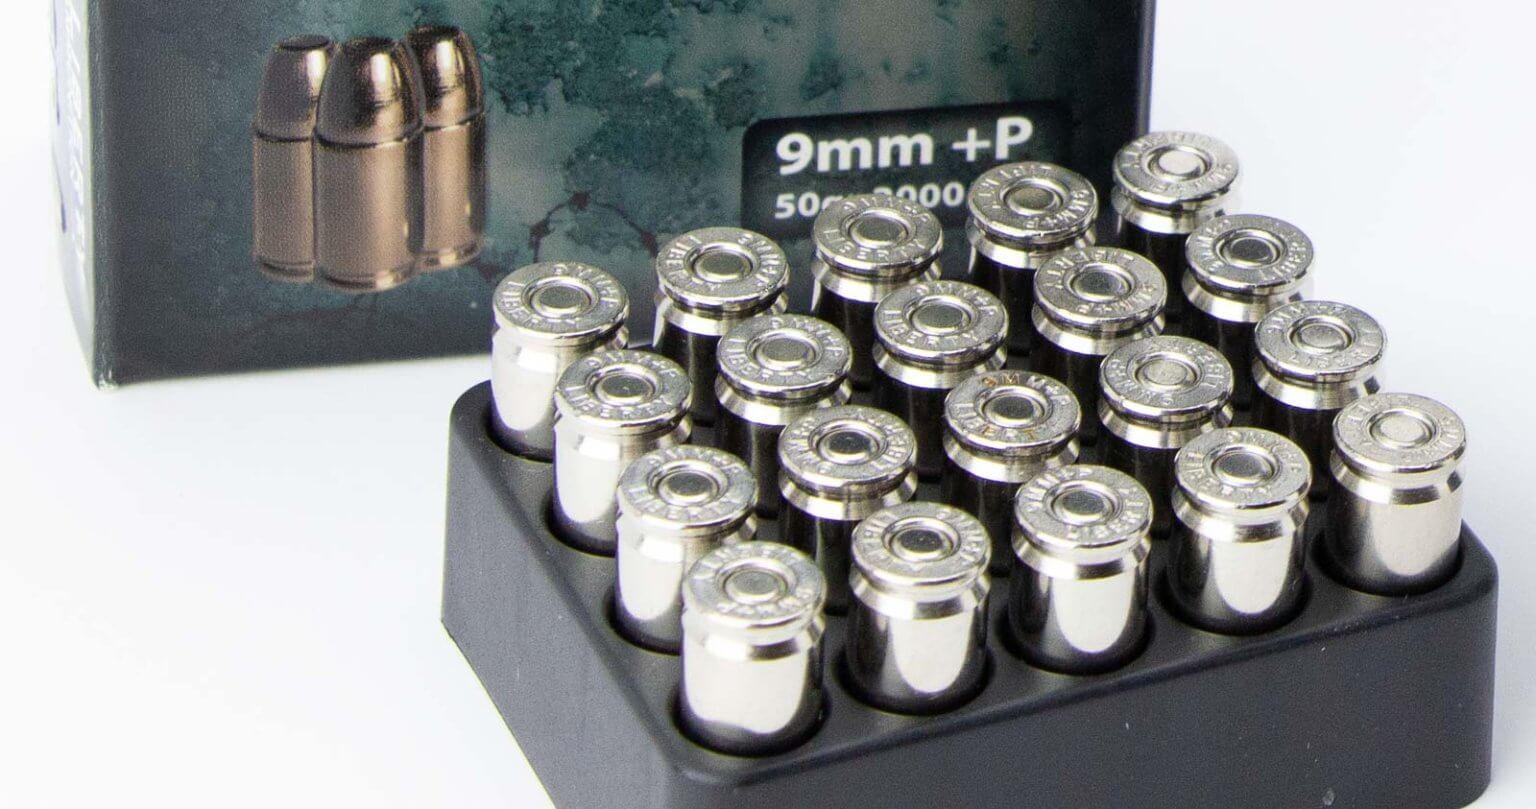 9mm personal defense ammunition